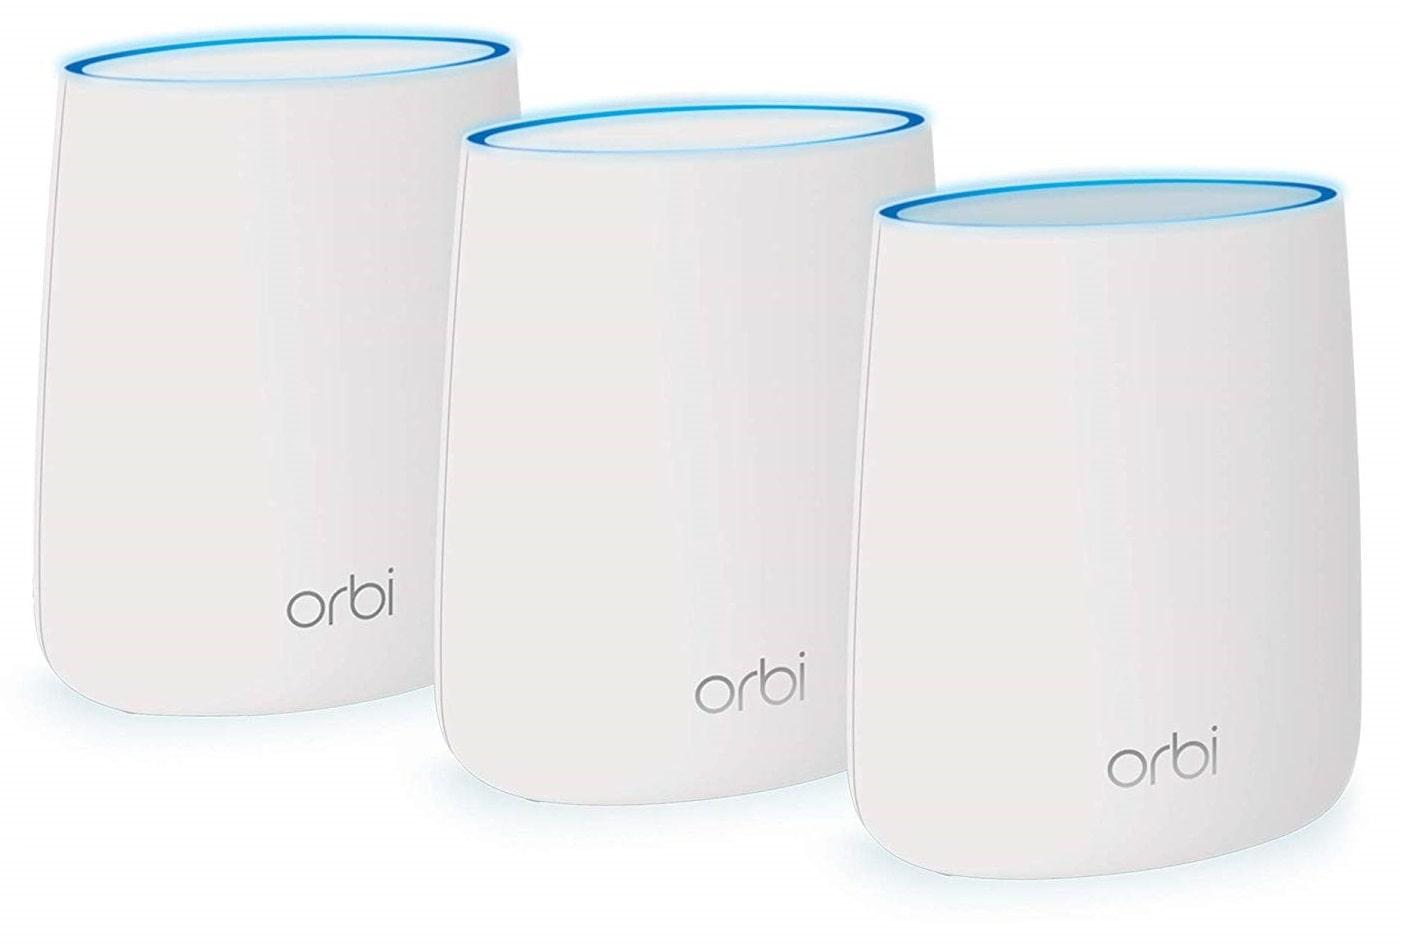 NETGEAR Orbi Whole Home Mesh WiFi System